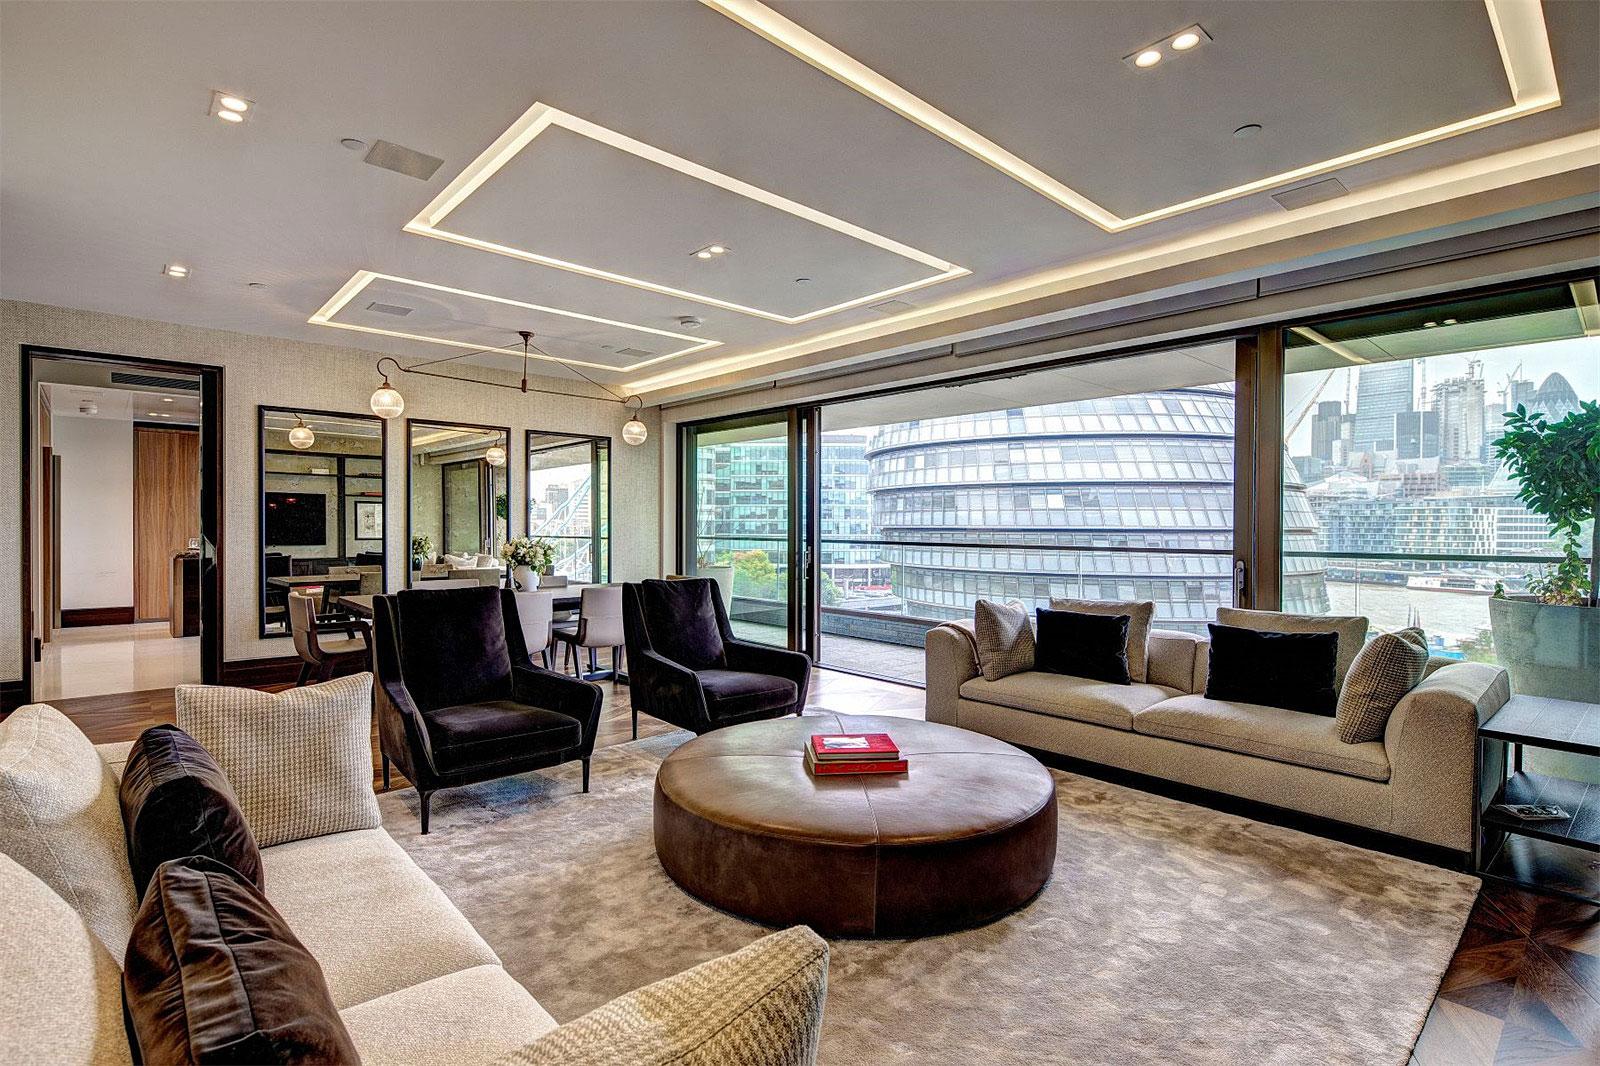 Blenheim House, One Tower Bridge, London, United Kingdom | Shereen Malik, United Kingdom Sotheby's International Realty |FINEST RESIDENCES - 2